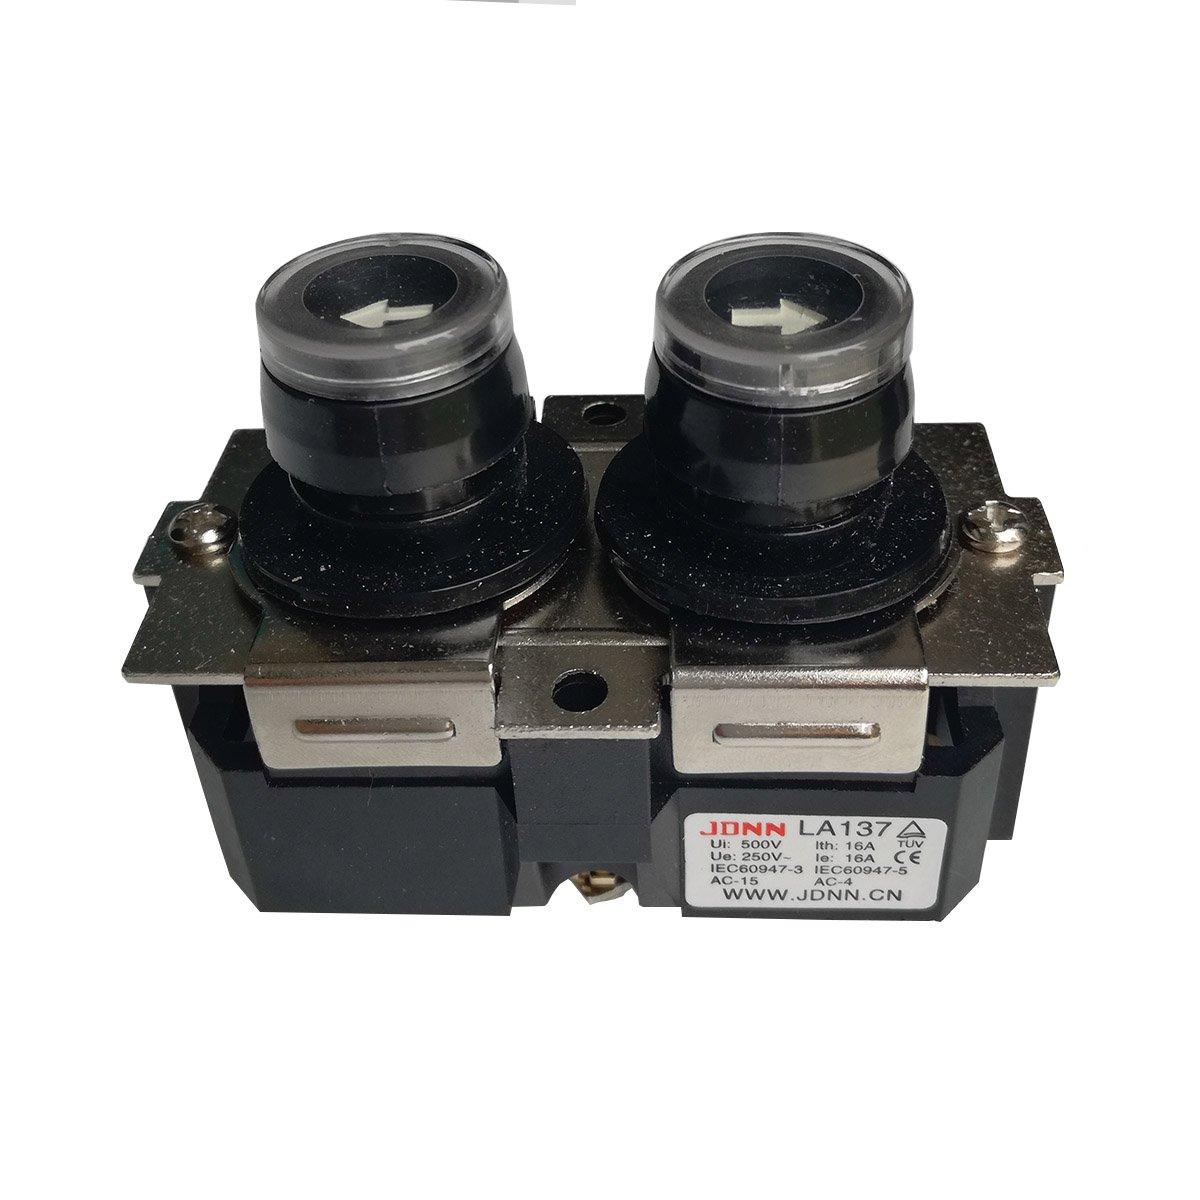 LA137 16A Up Down Waterproof NO Push Button Switch Micro-electric Control Pushbutton Switches for Crane Electric Hoist 220VDC 380VAC (LA137-B)